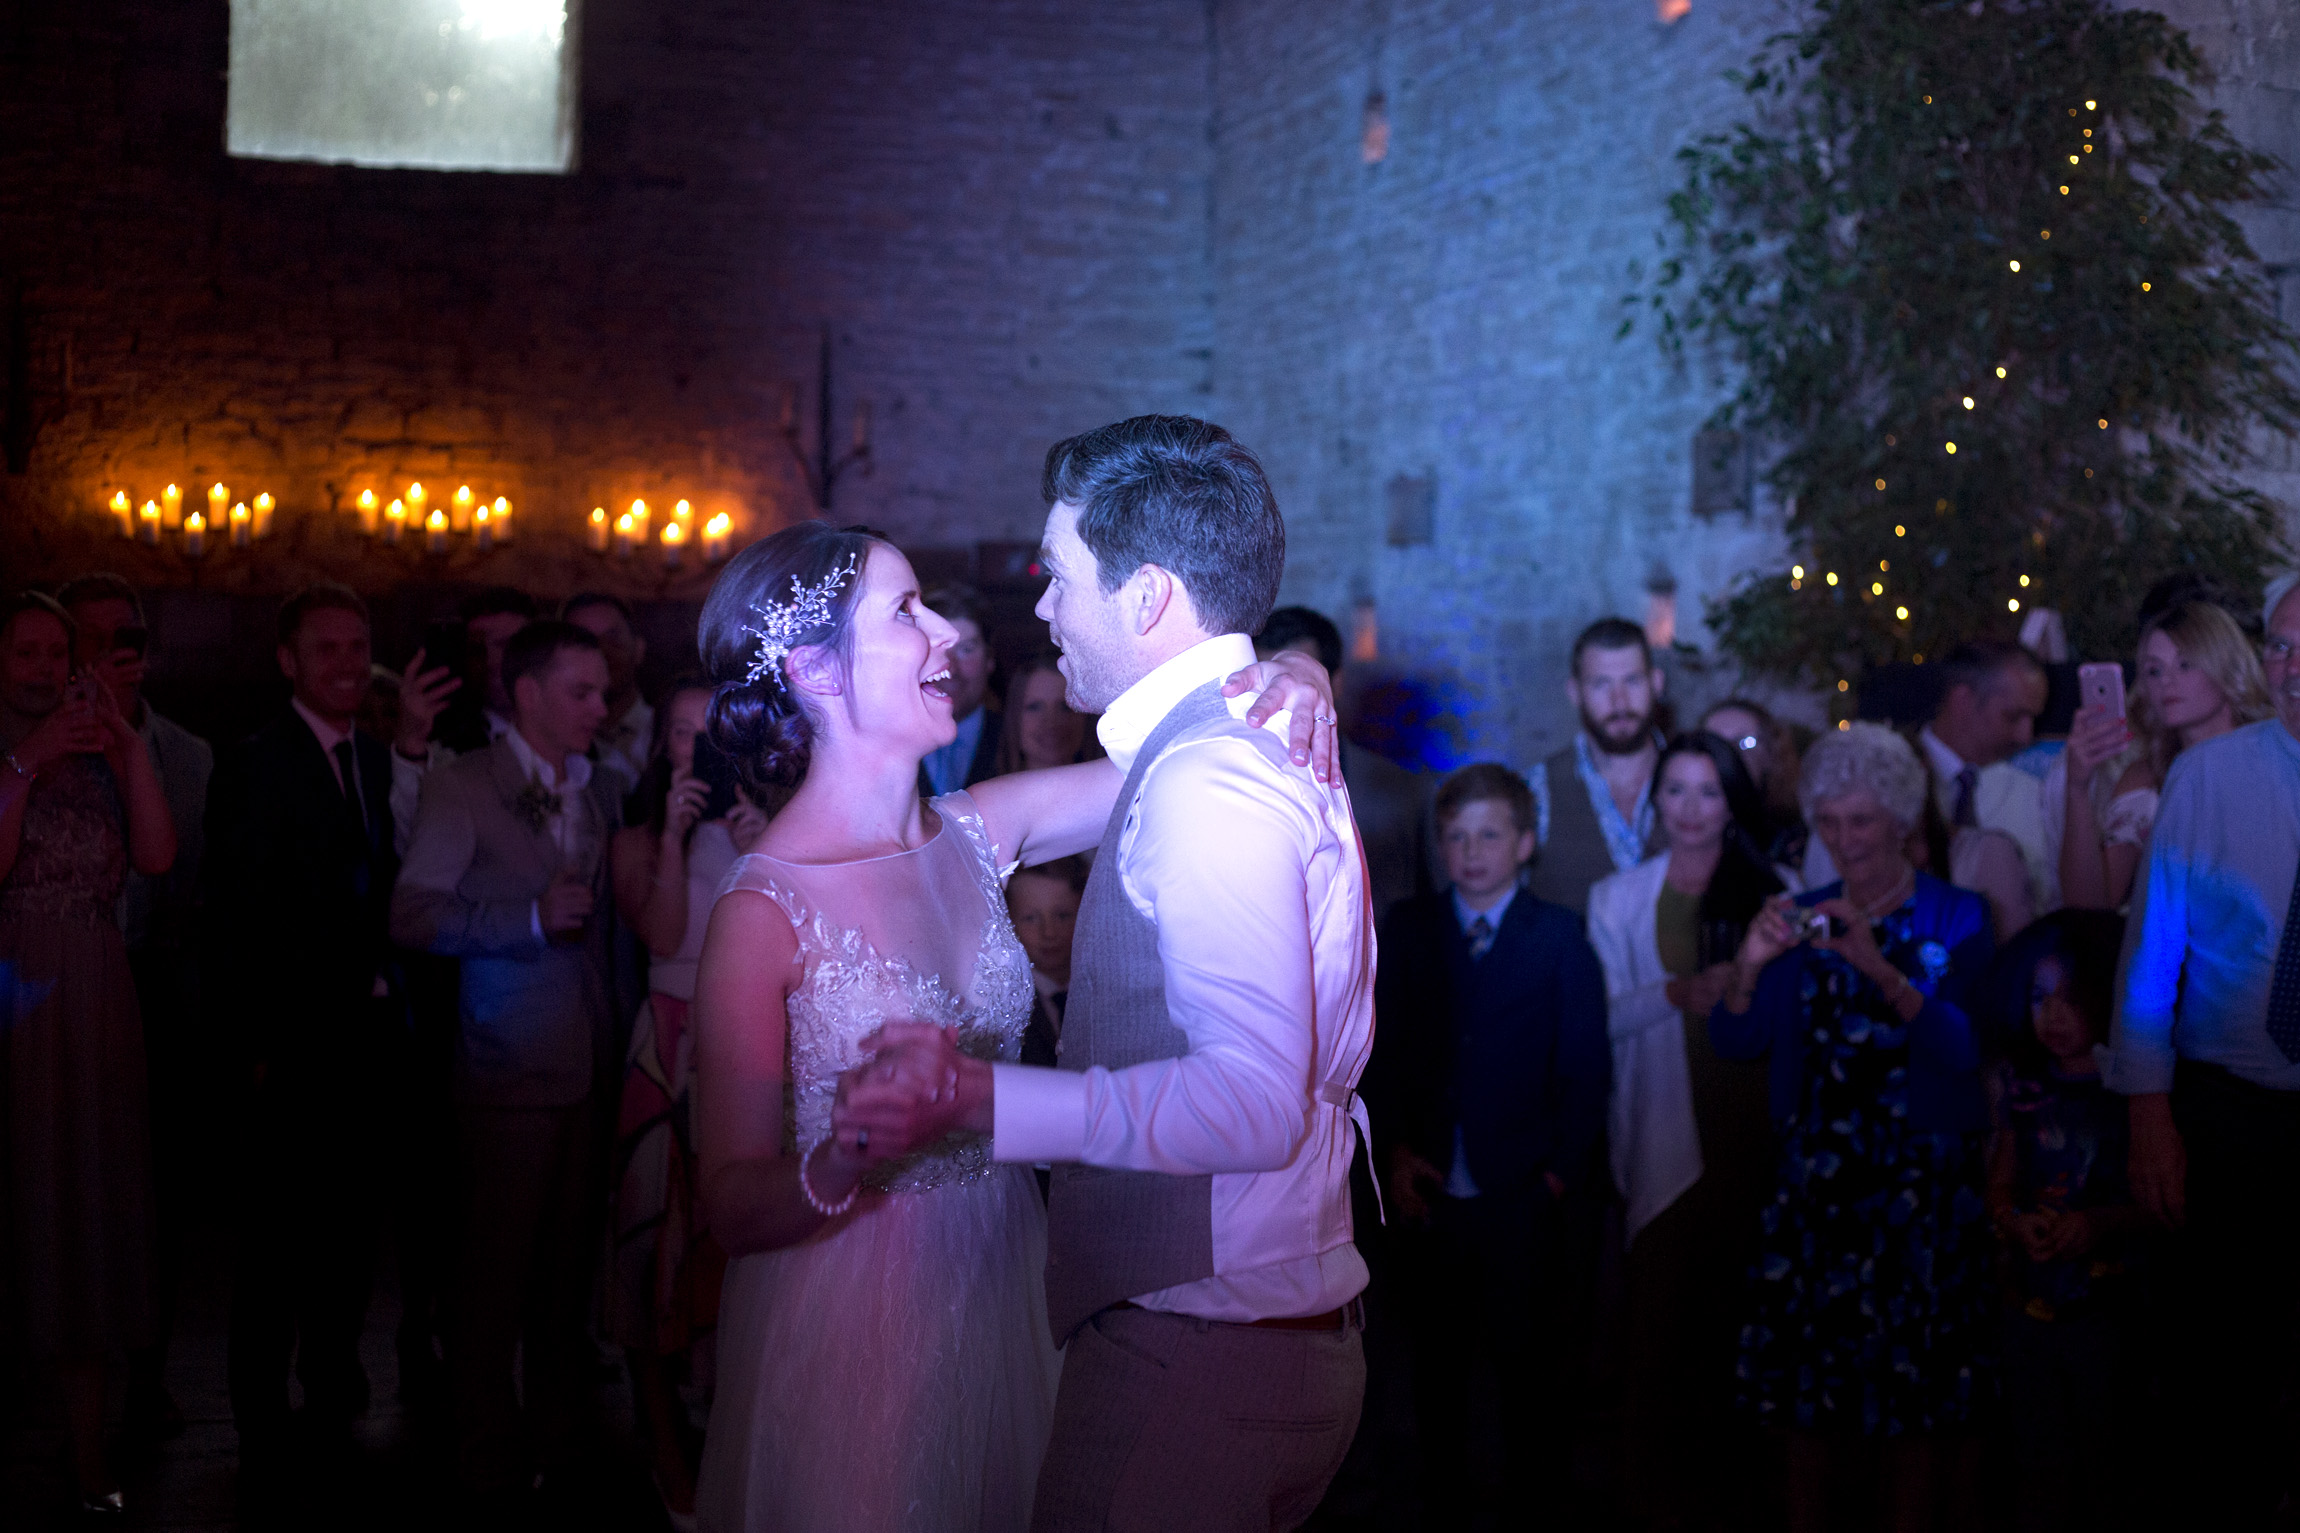 First dance bride and groom portrait shoot in cornfield Cripps barn outdoor wedding photographer